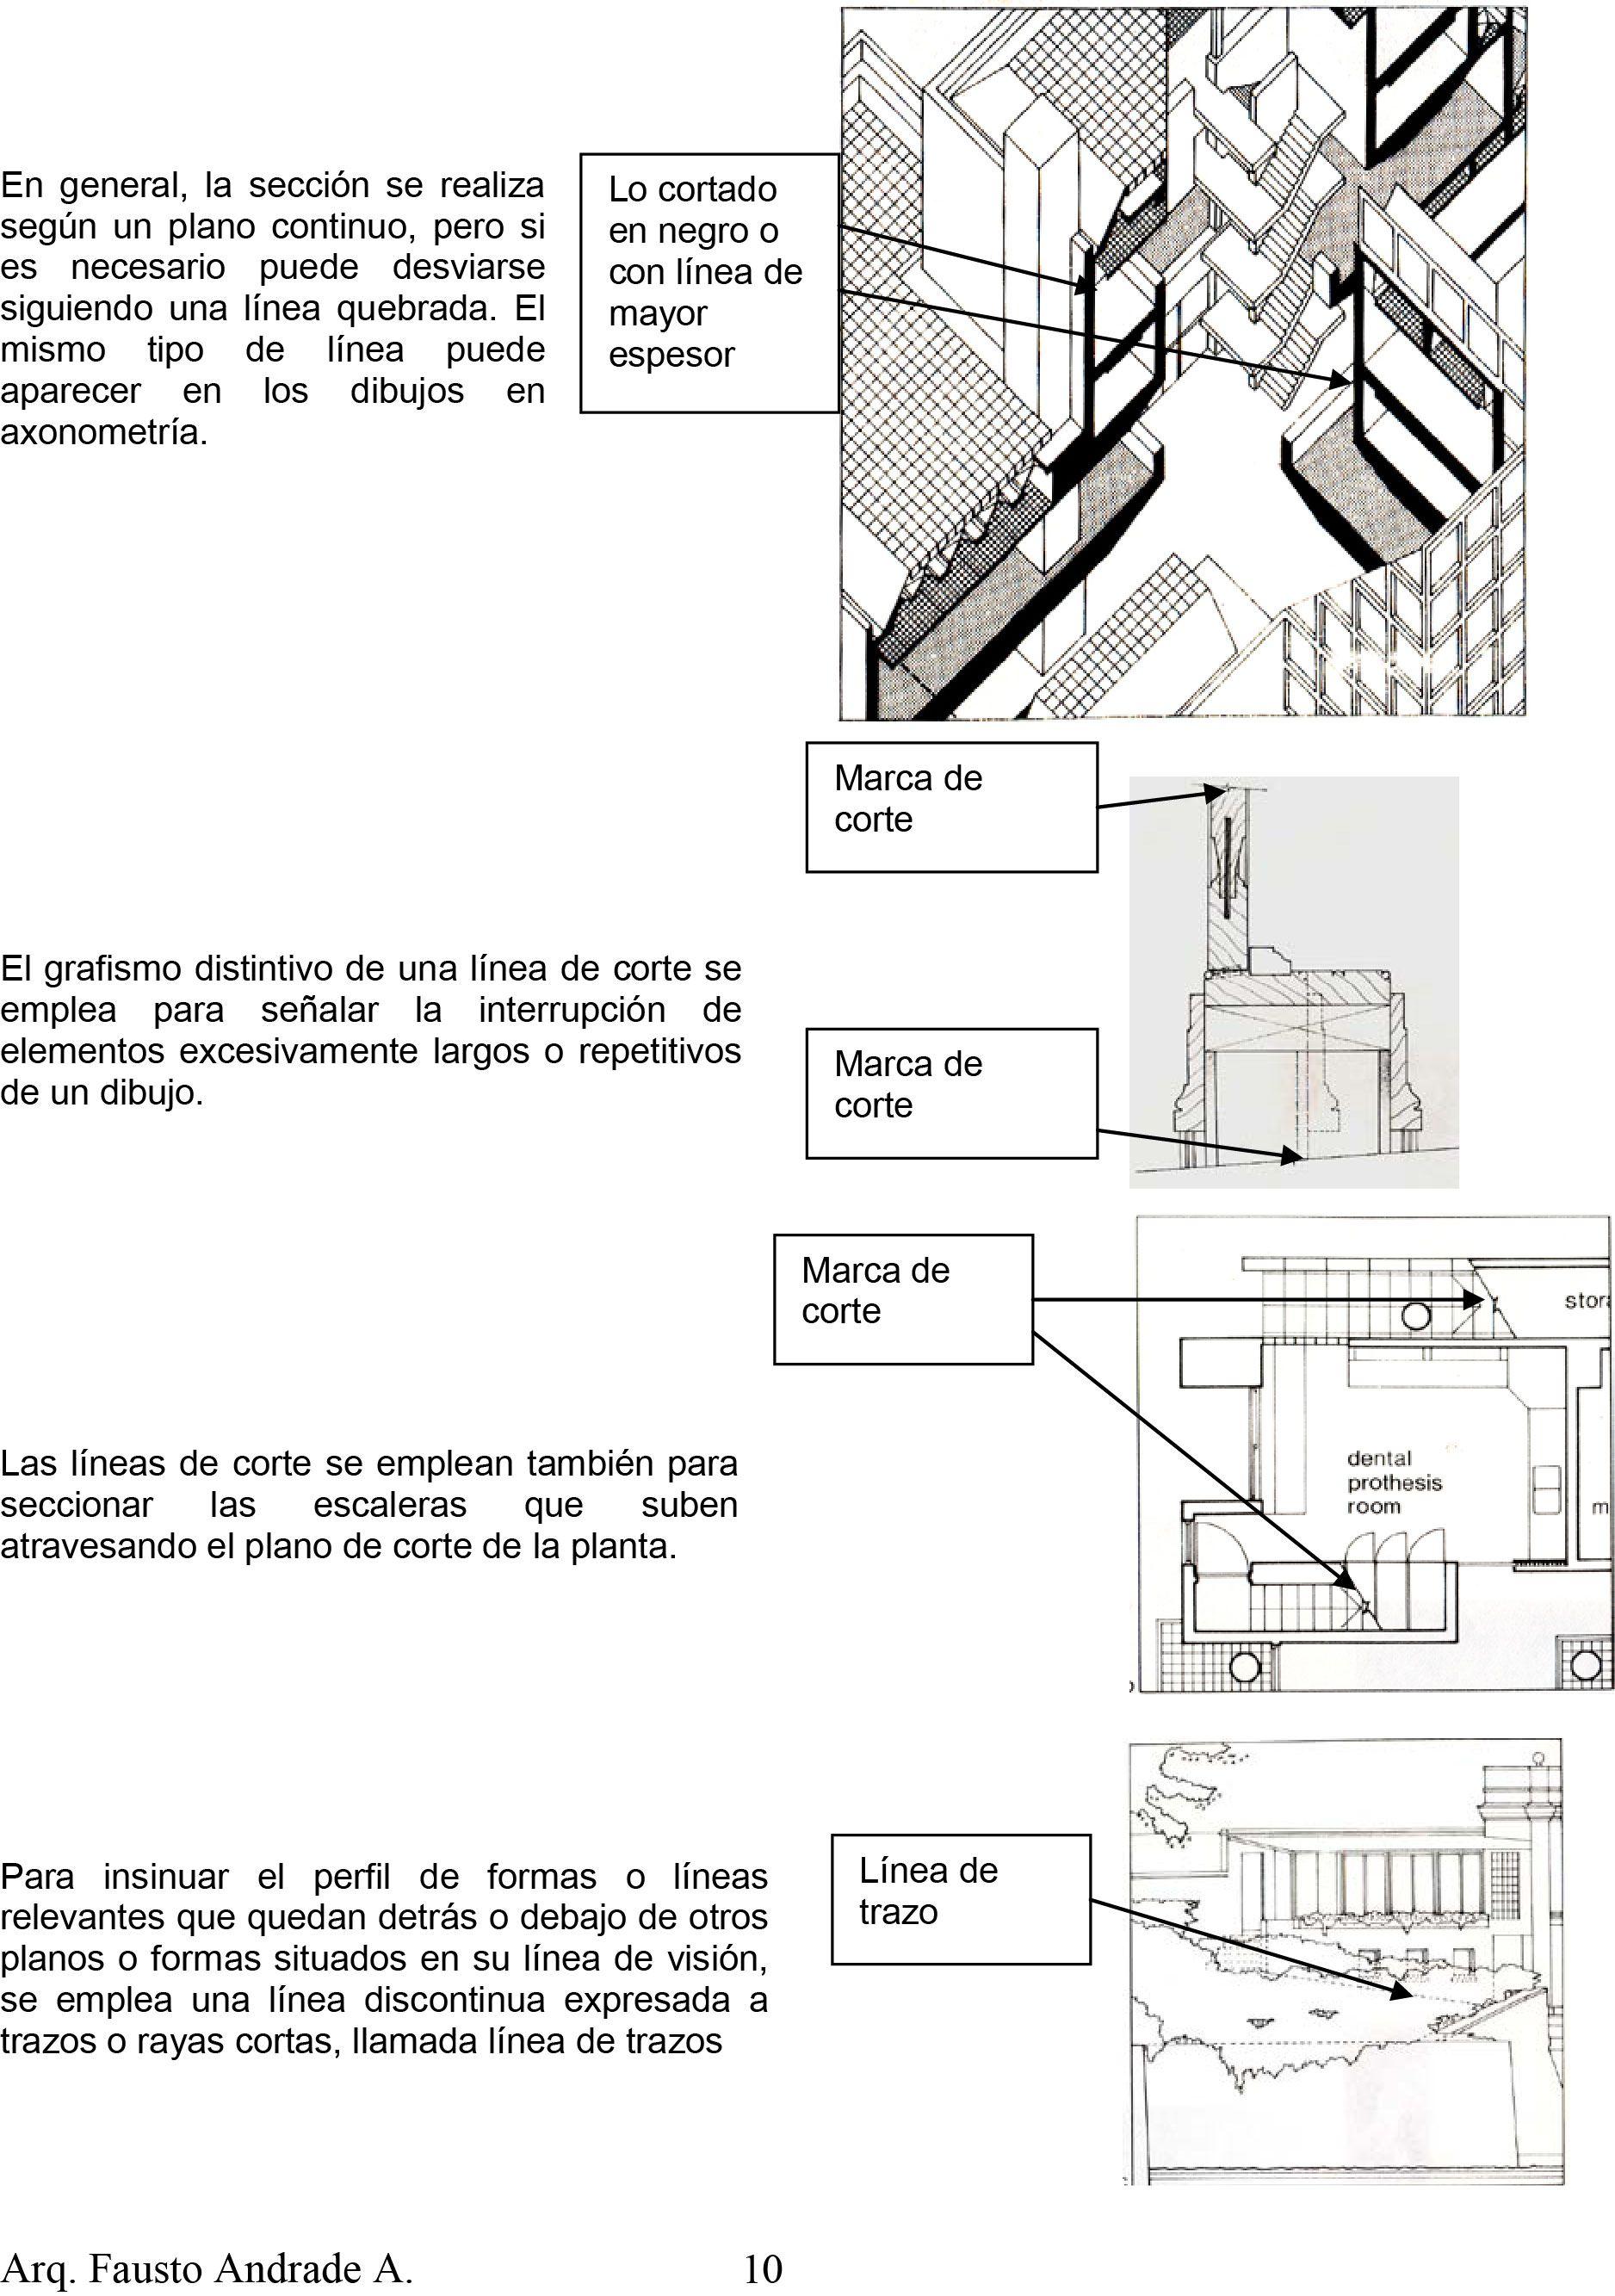 Pin De Representacion Iii En 00 Autocad Referentes Axonometria Tipos De Líneas Planos